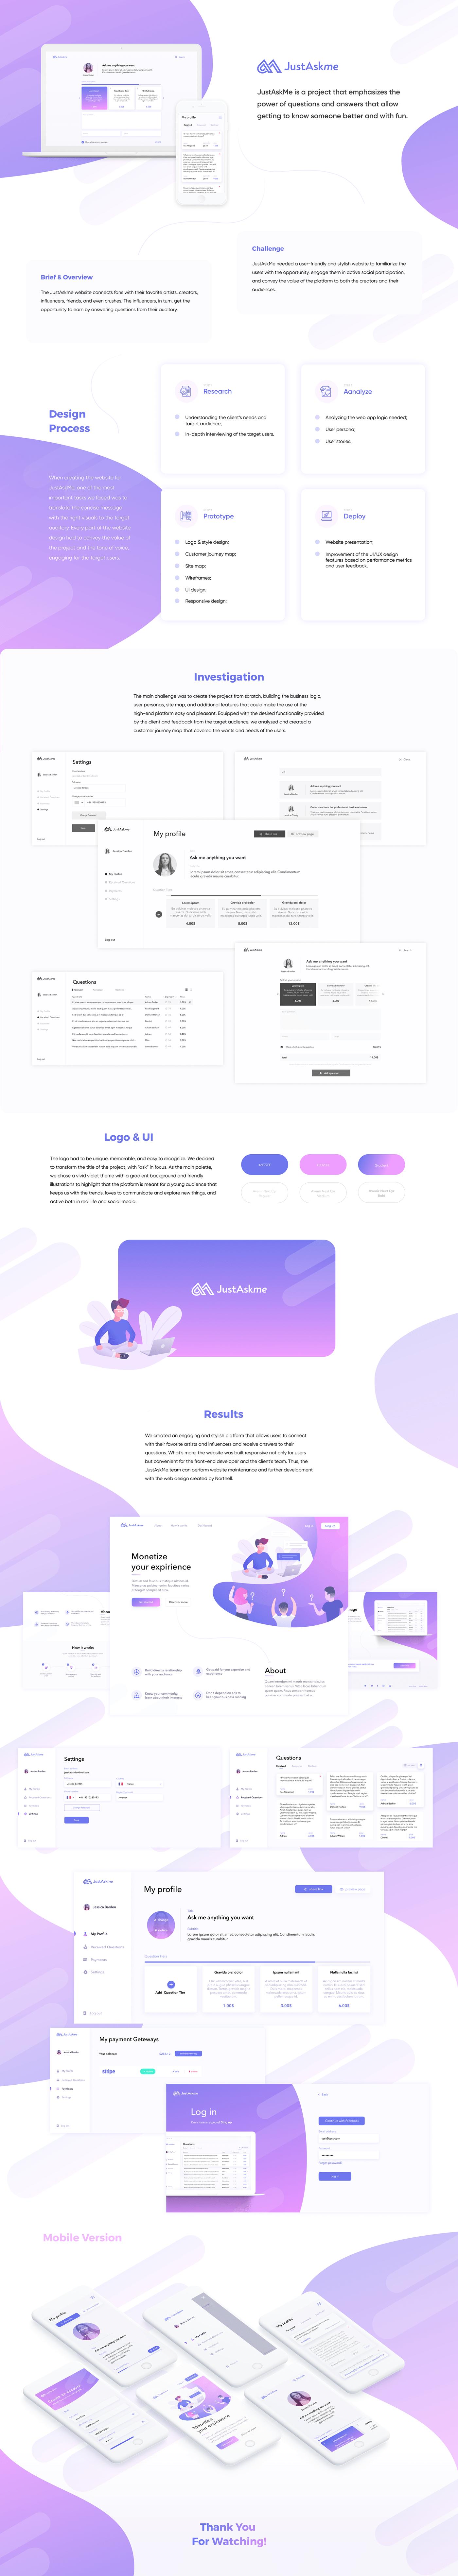 app design gamification INFLUENCER payment Platform SAAS social ux web app